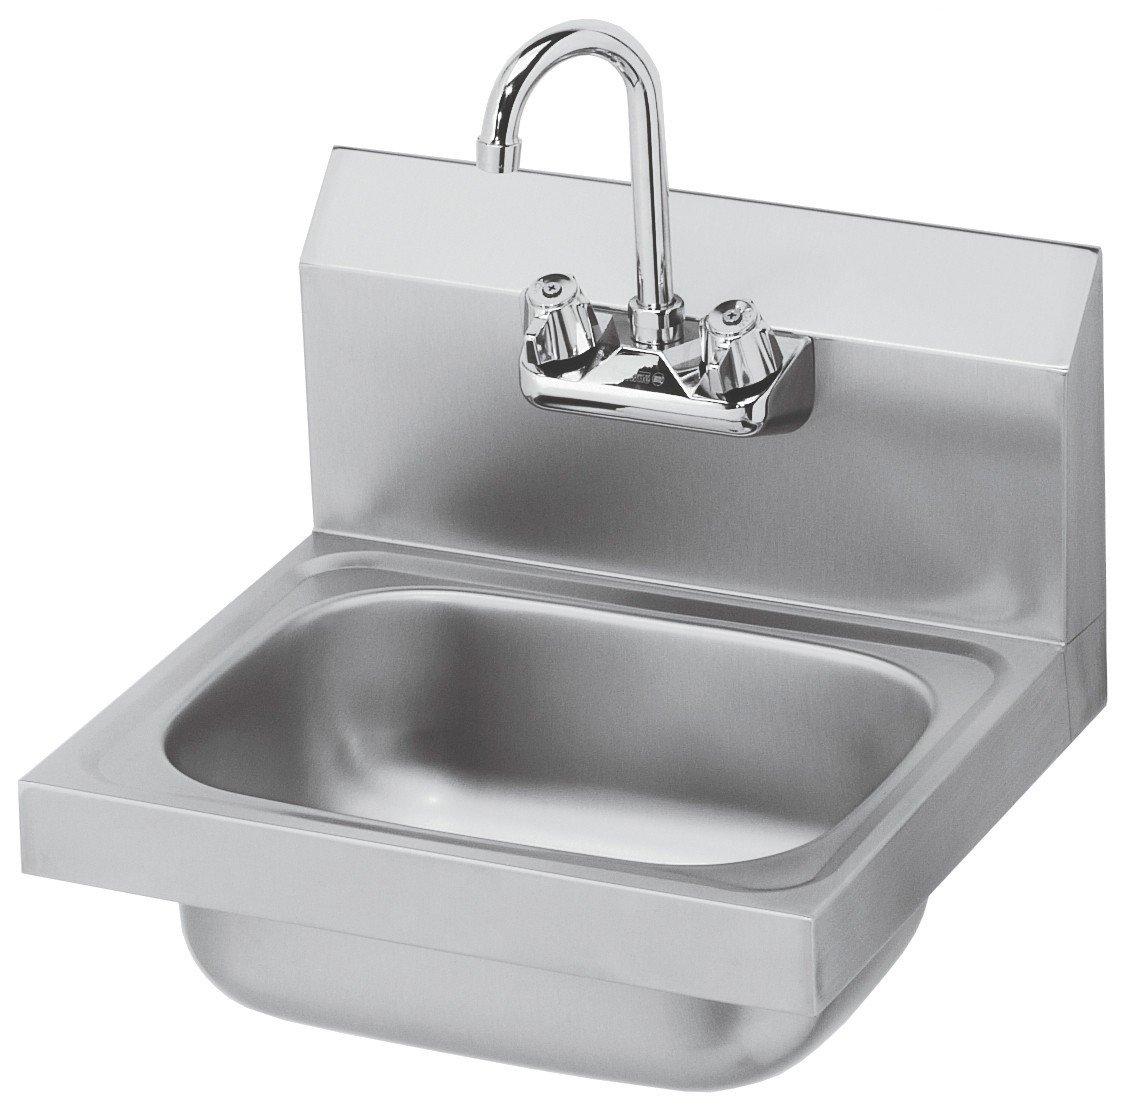 HS-2L Krowne 16 Wide Hand Sink Compliant